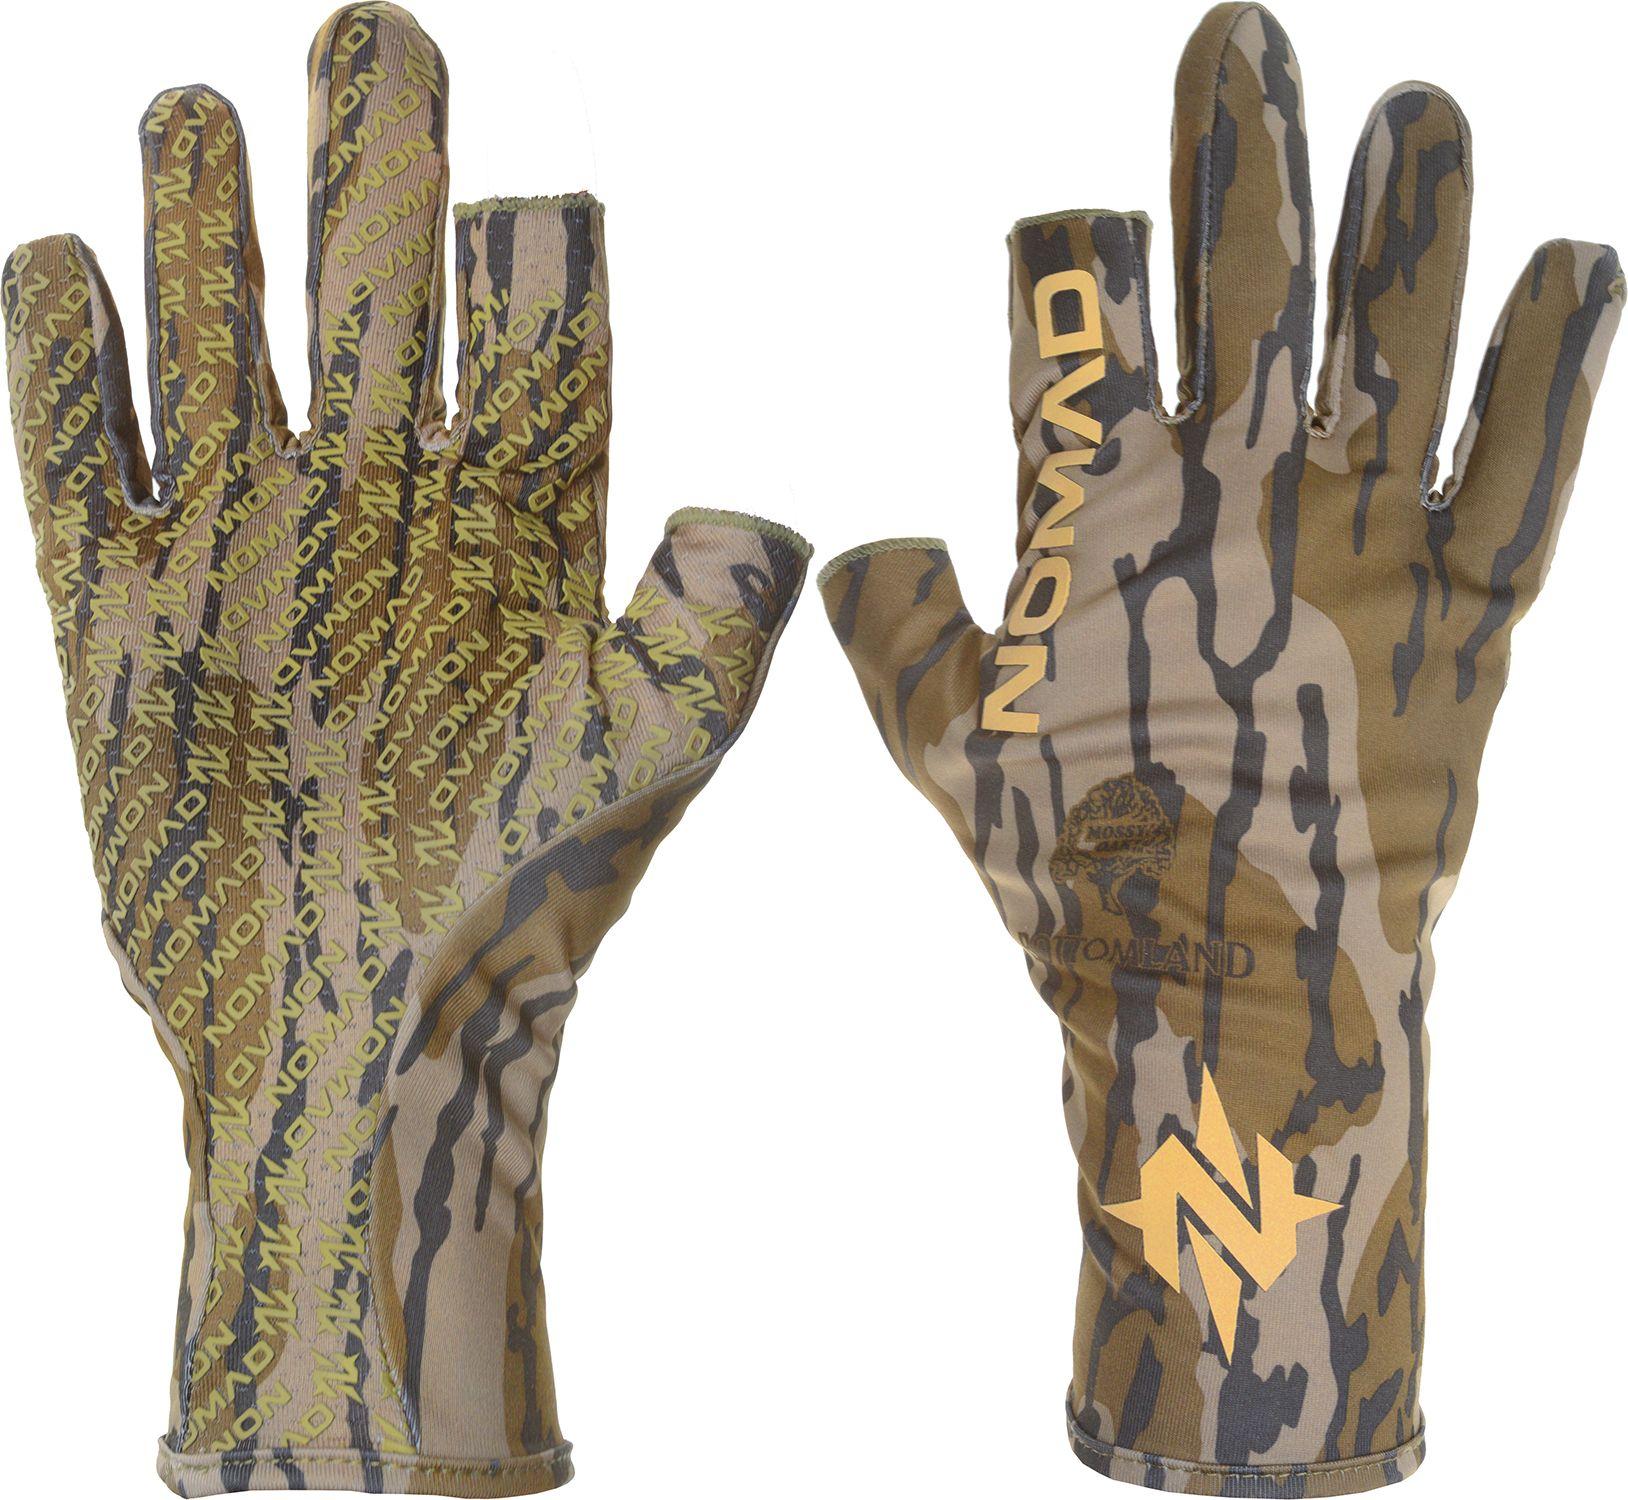 Nomad Men's Fingerless Turkey Gloves, Mossy Oak Blades thumbnail